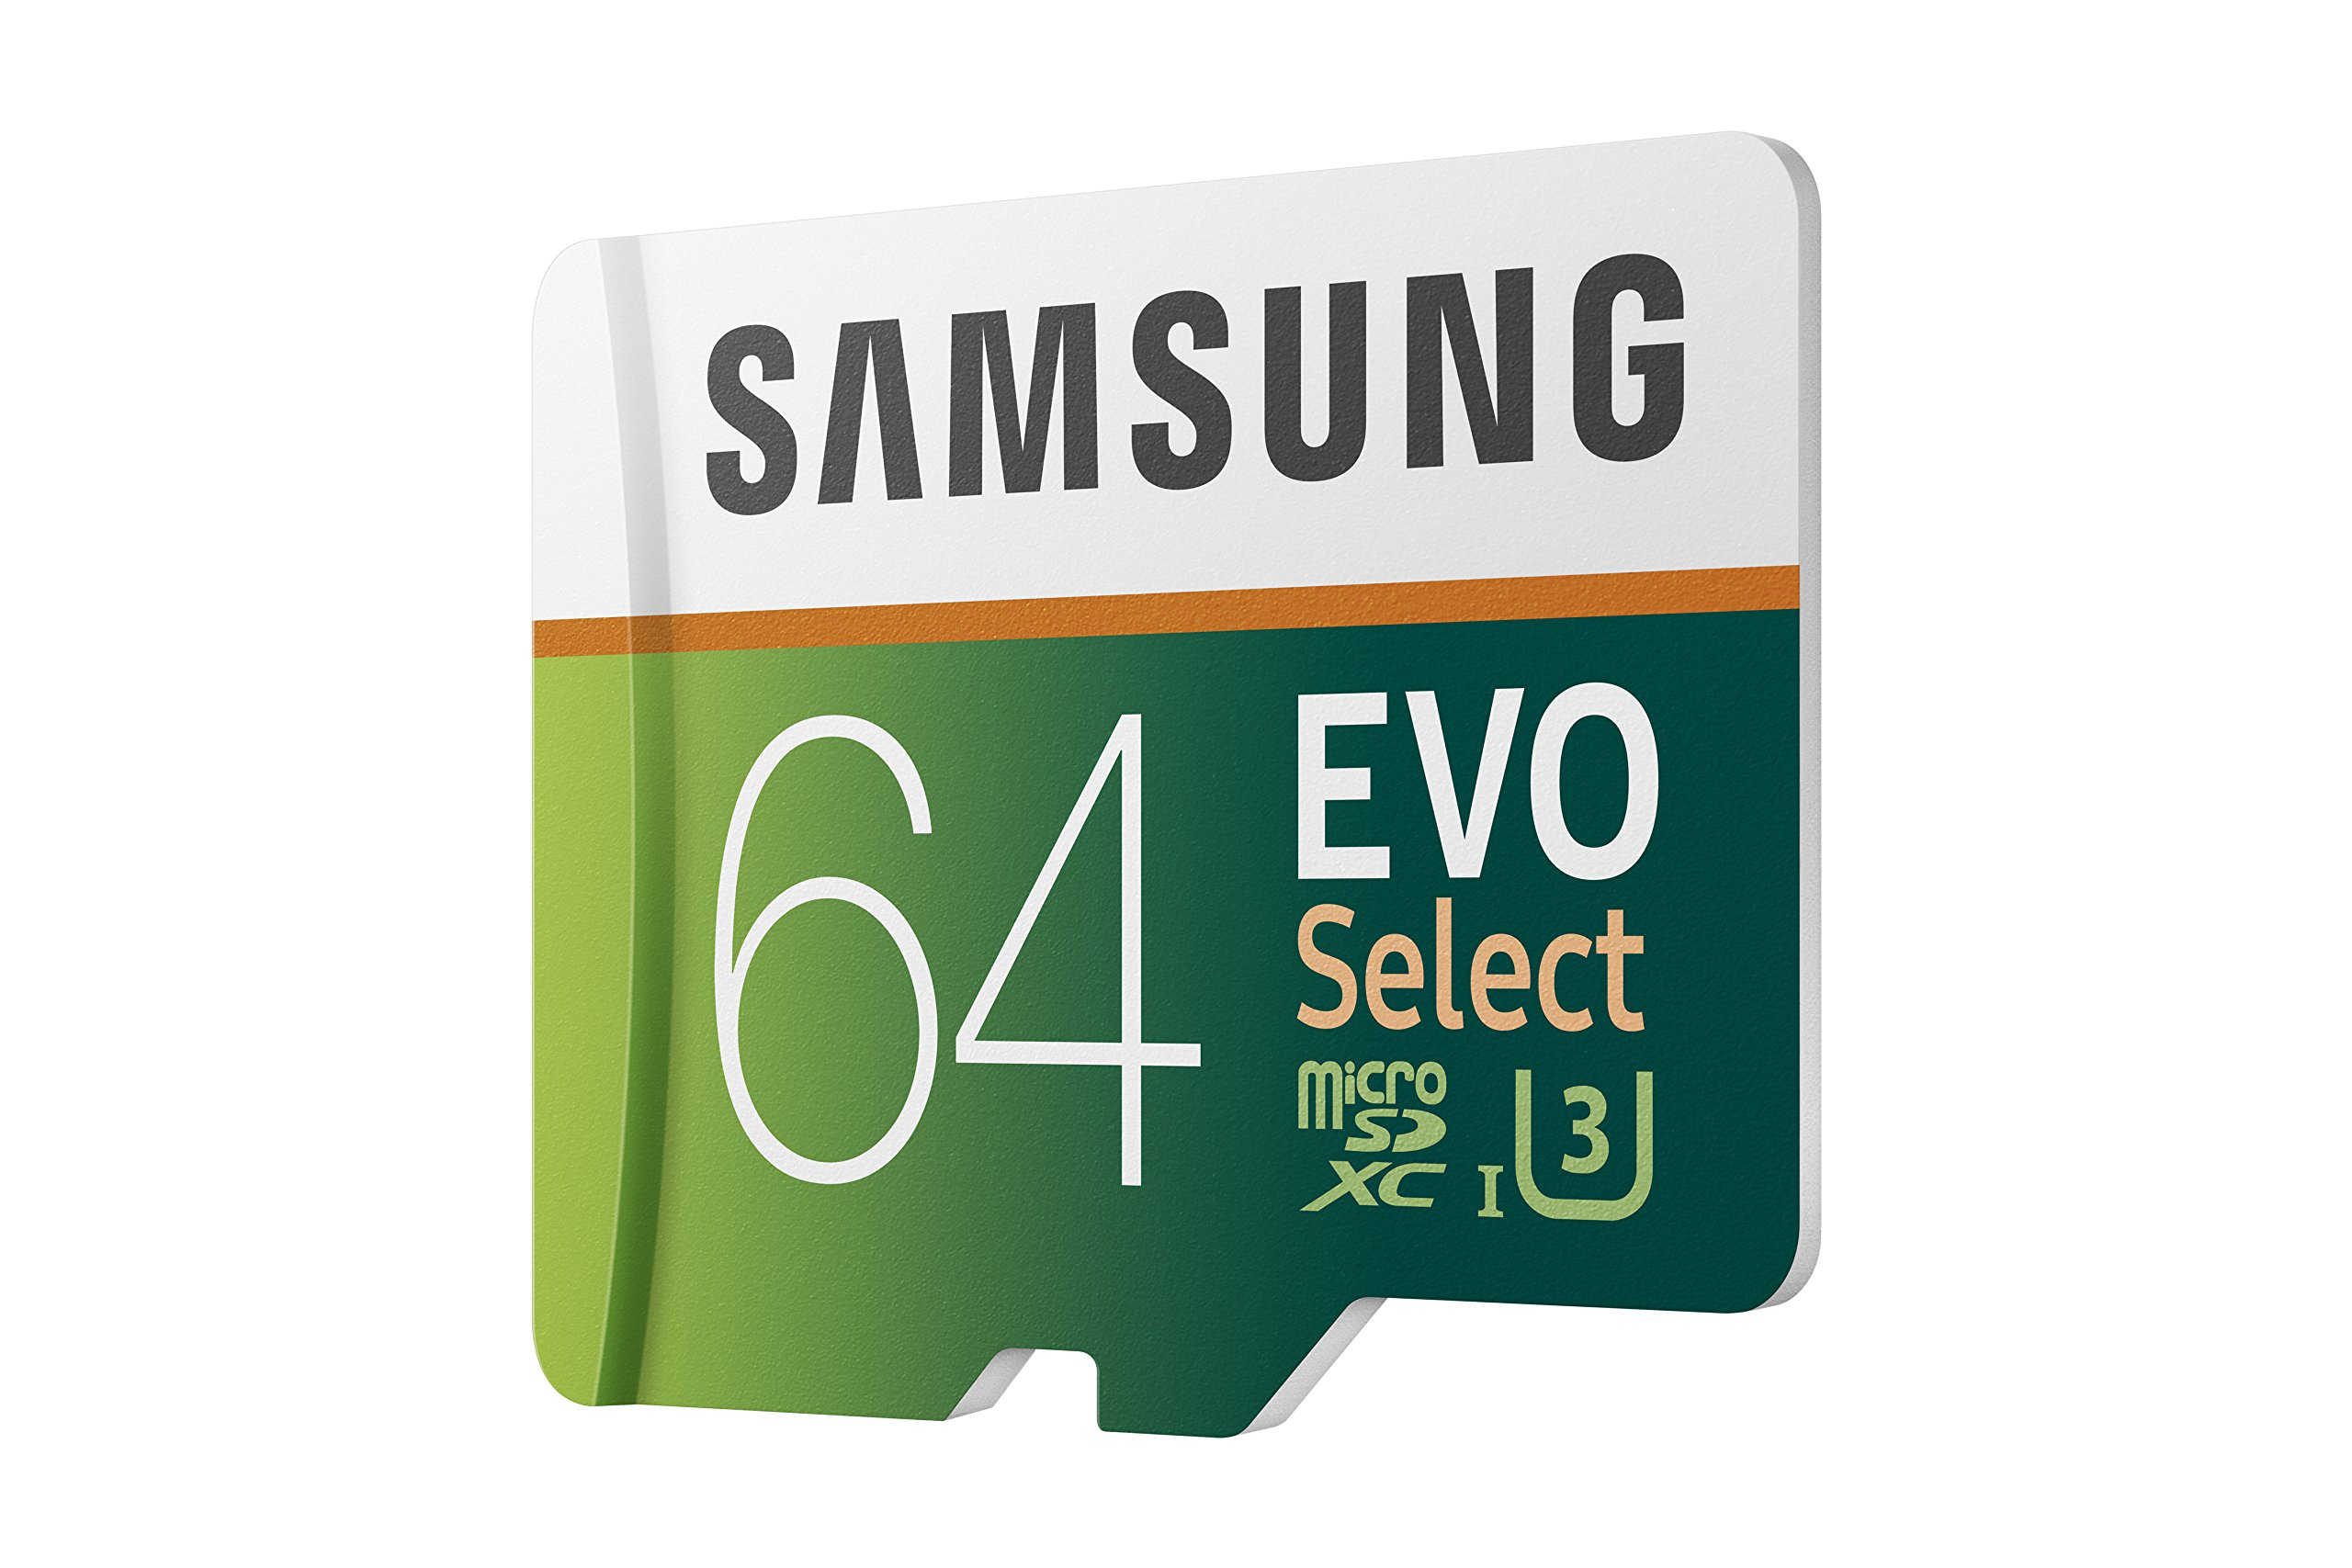 Samsung 64GB 100MB/s (U3) MicroSDXC EVO Select Memory Card with Adapter (MB-ME64GA/AM) by Samsung (Image #5)